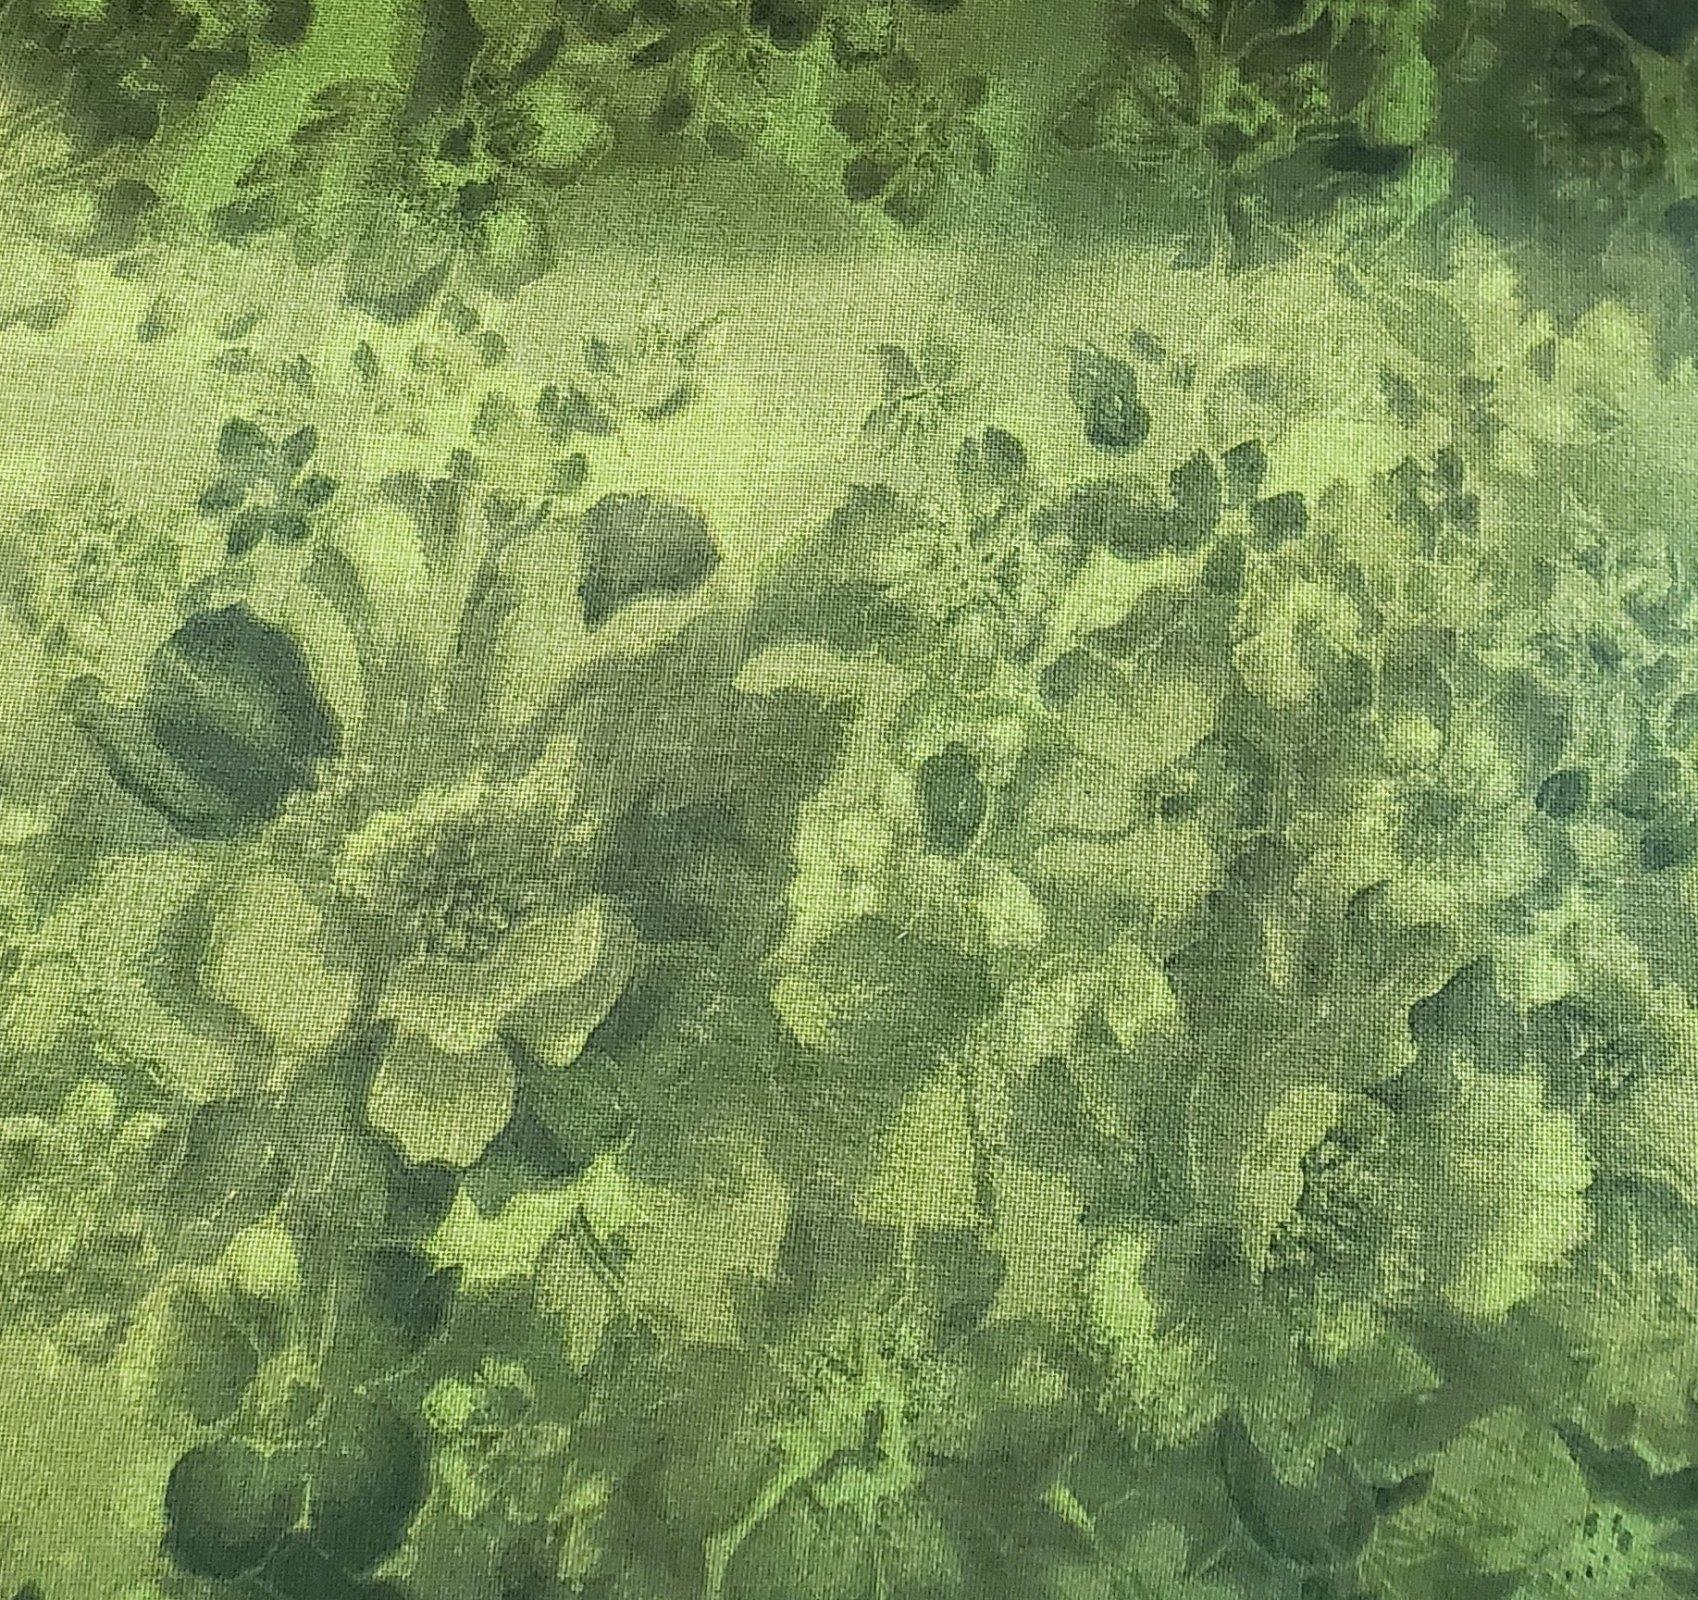 3 Yard Backing Piece: 108 Wide Avocado Faded Flowers in a single 3 yard piece